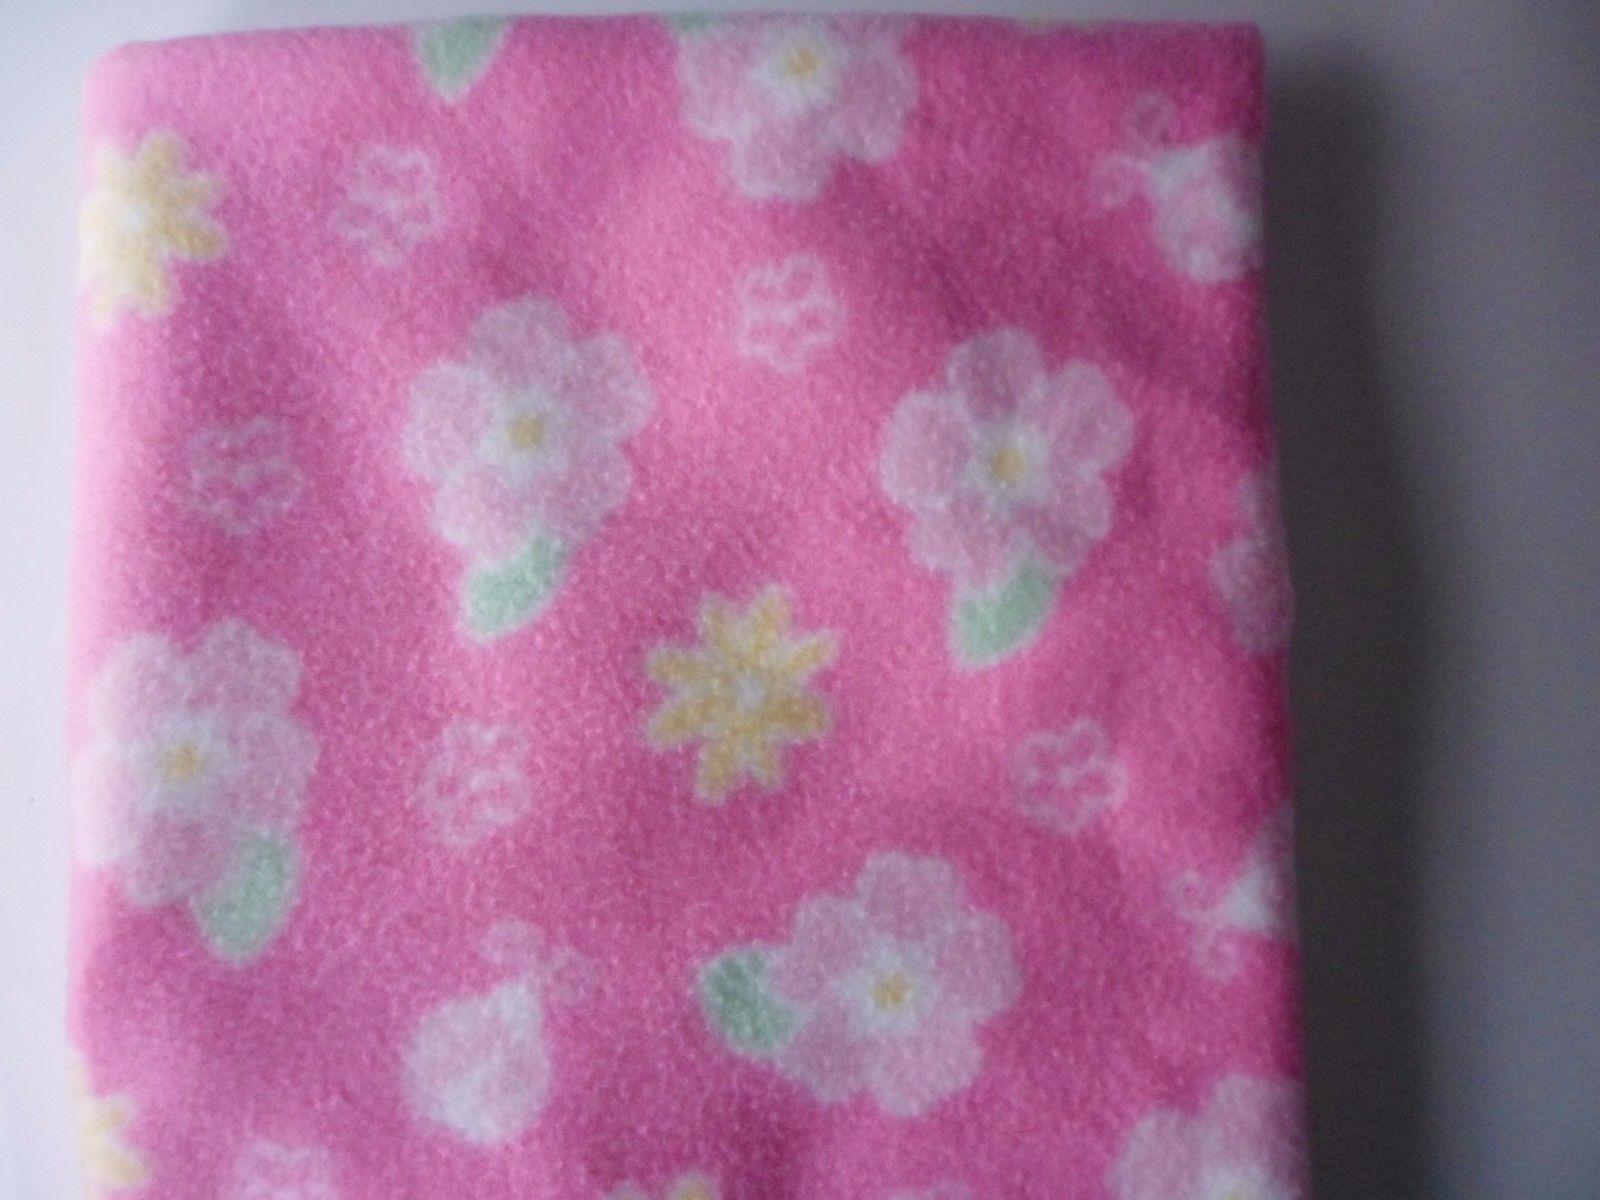 Parents Choice Pink Floral Flowers Baby Blanket Ladybug Soft Plush